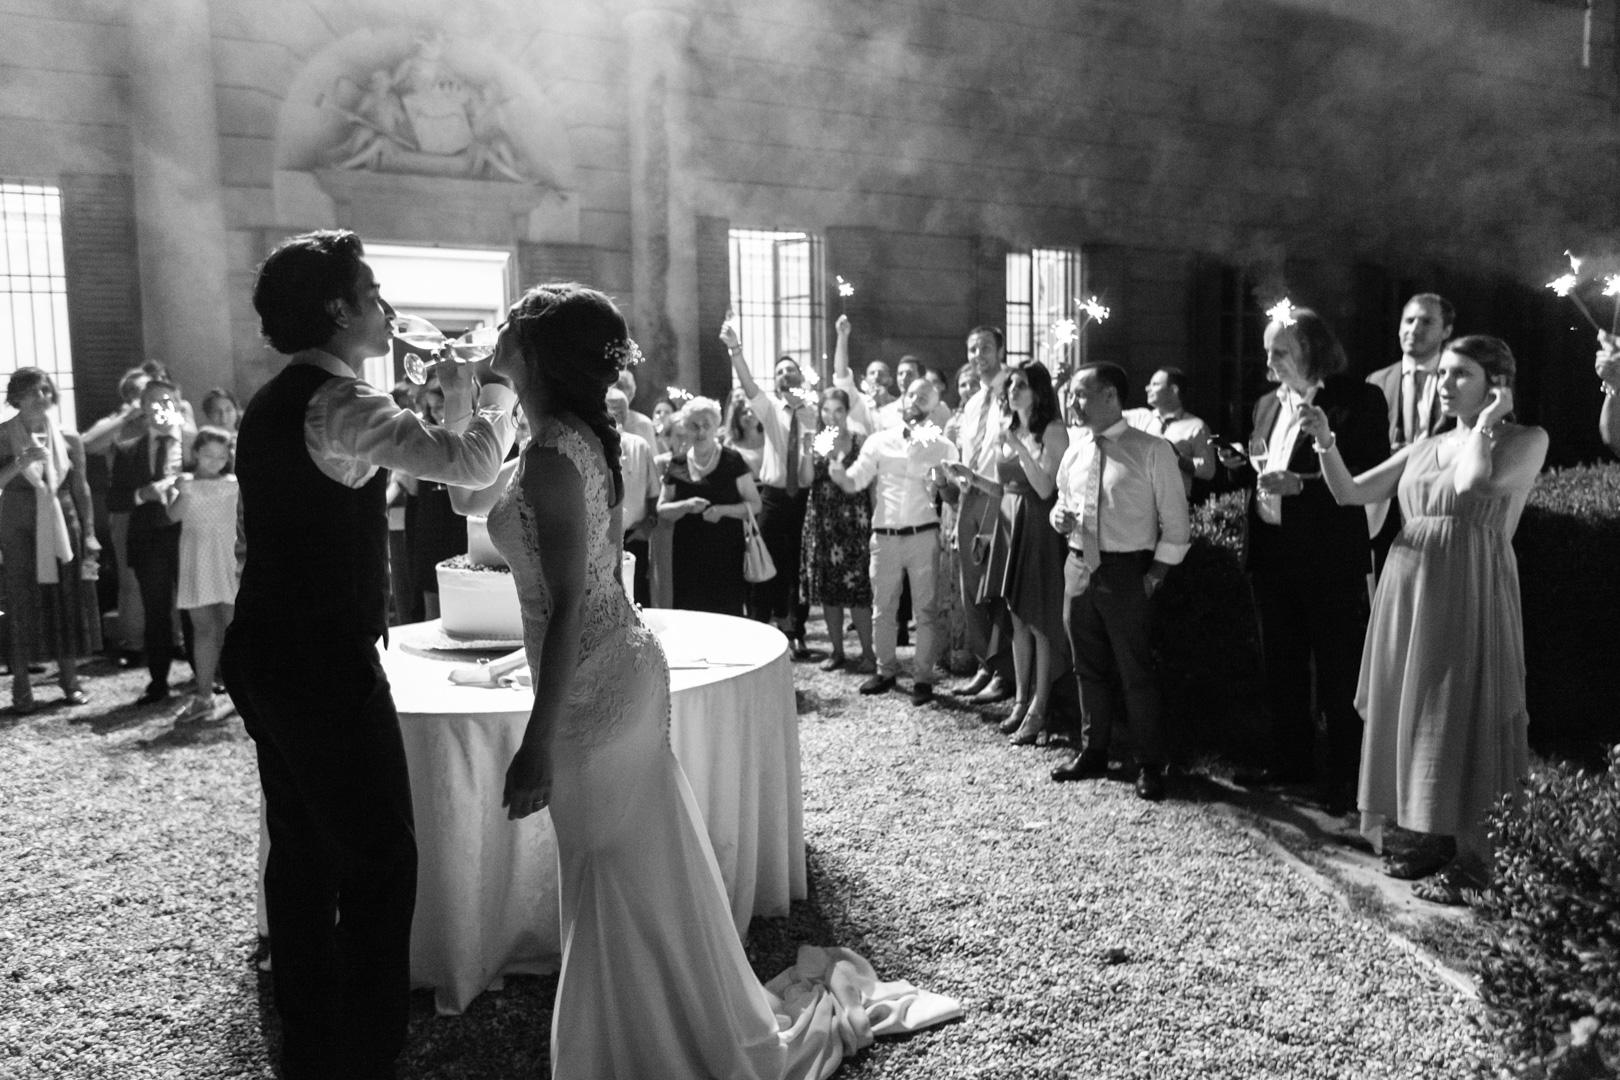 Andreas_Pinacci_Wedding_Photographer-41.